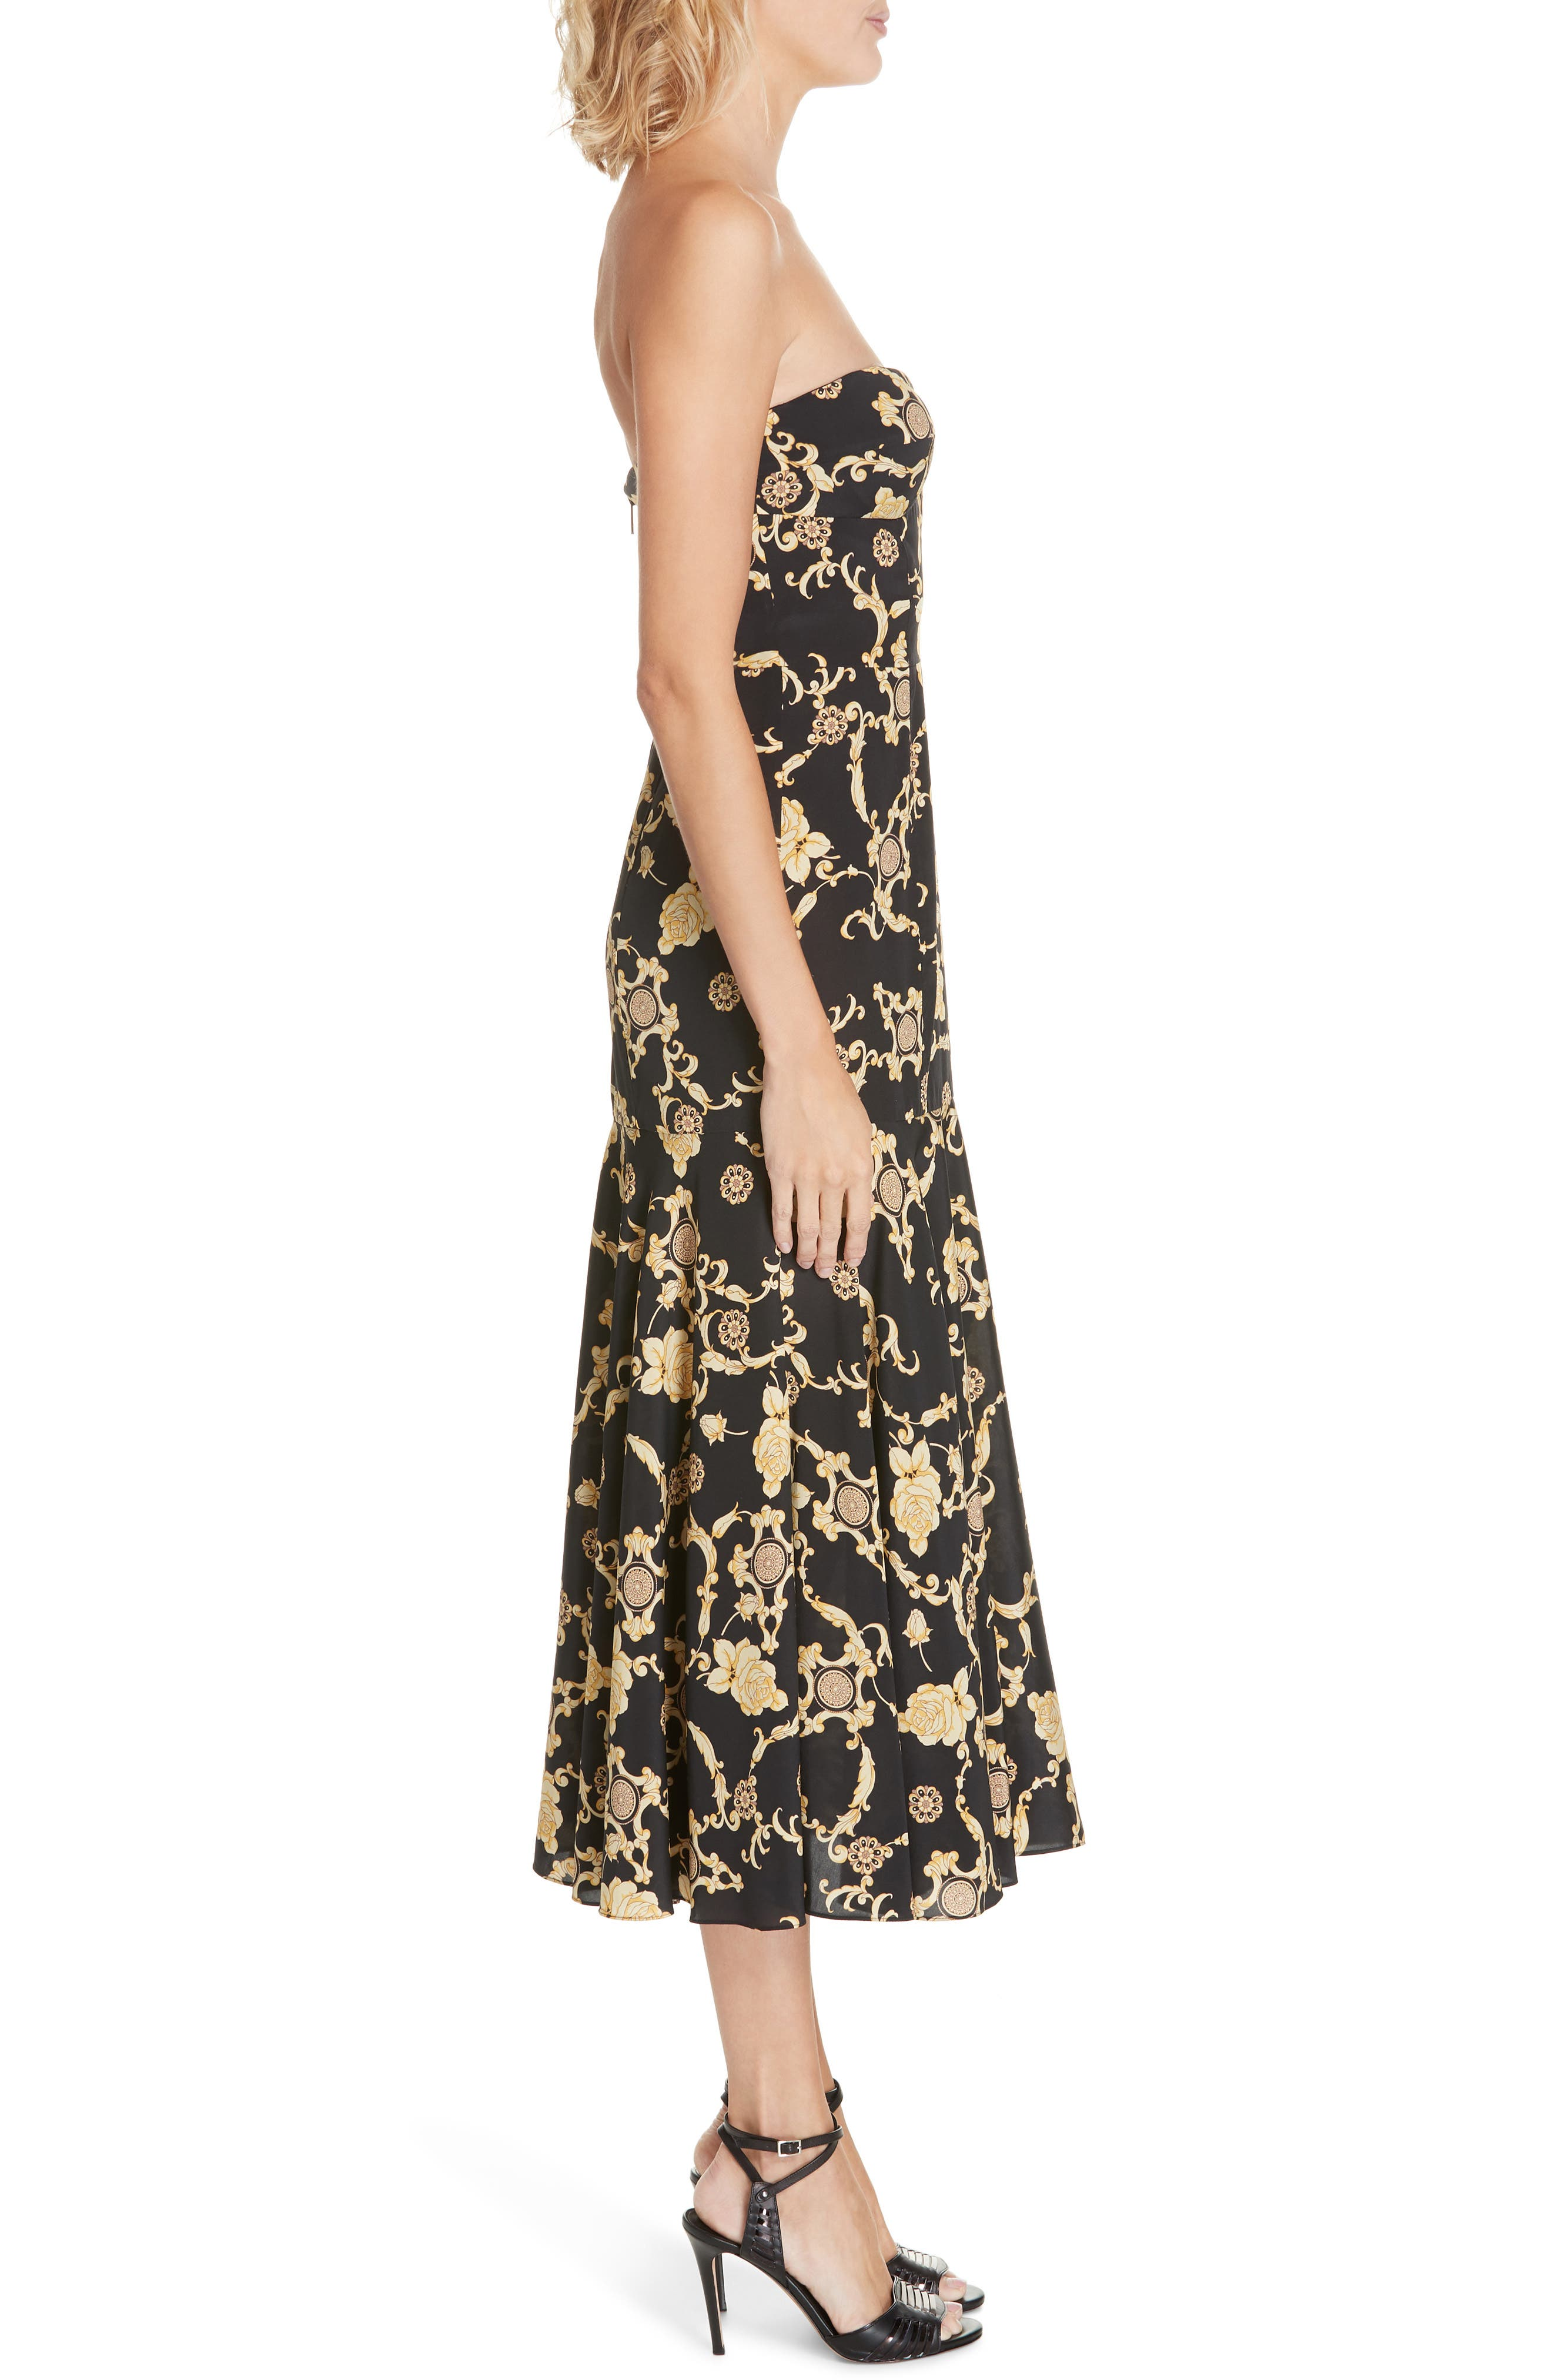 Annika Floral Print Strapless Stretch Silk Dress,                             Alternate thumbnail 3, color,                             BLACK/ GOLD